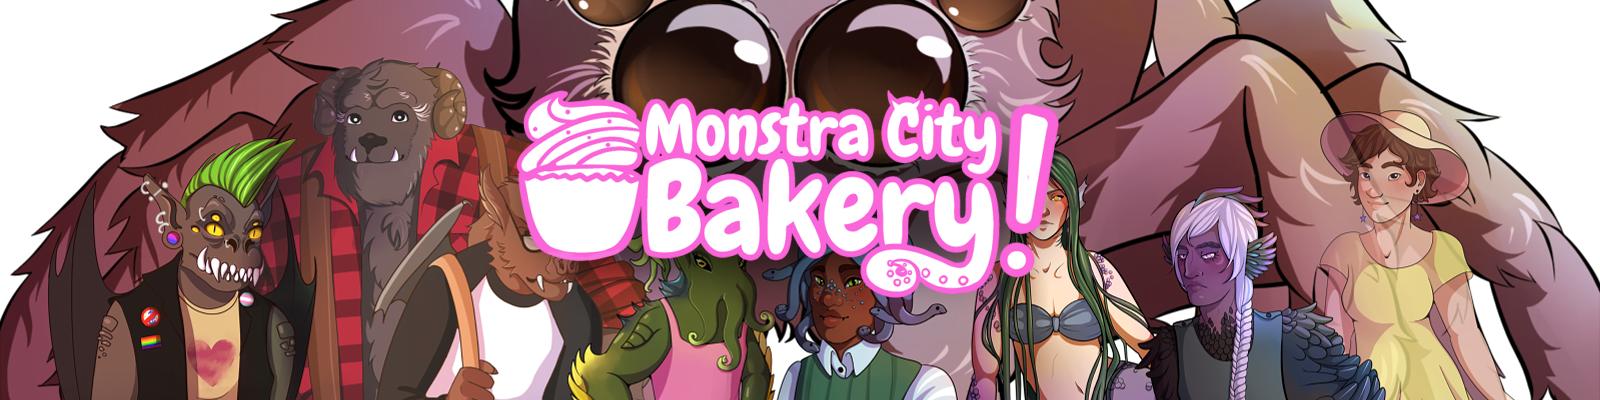 Monstra City Bakery!! (DEMO)